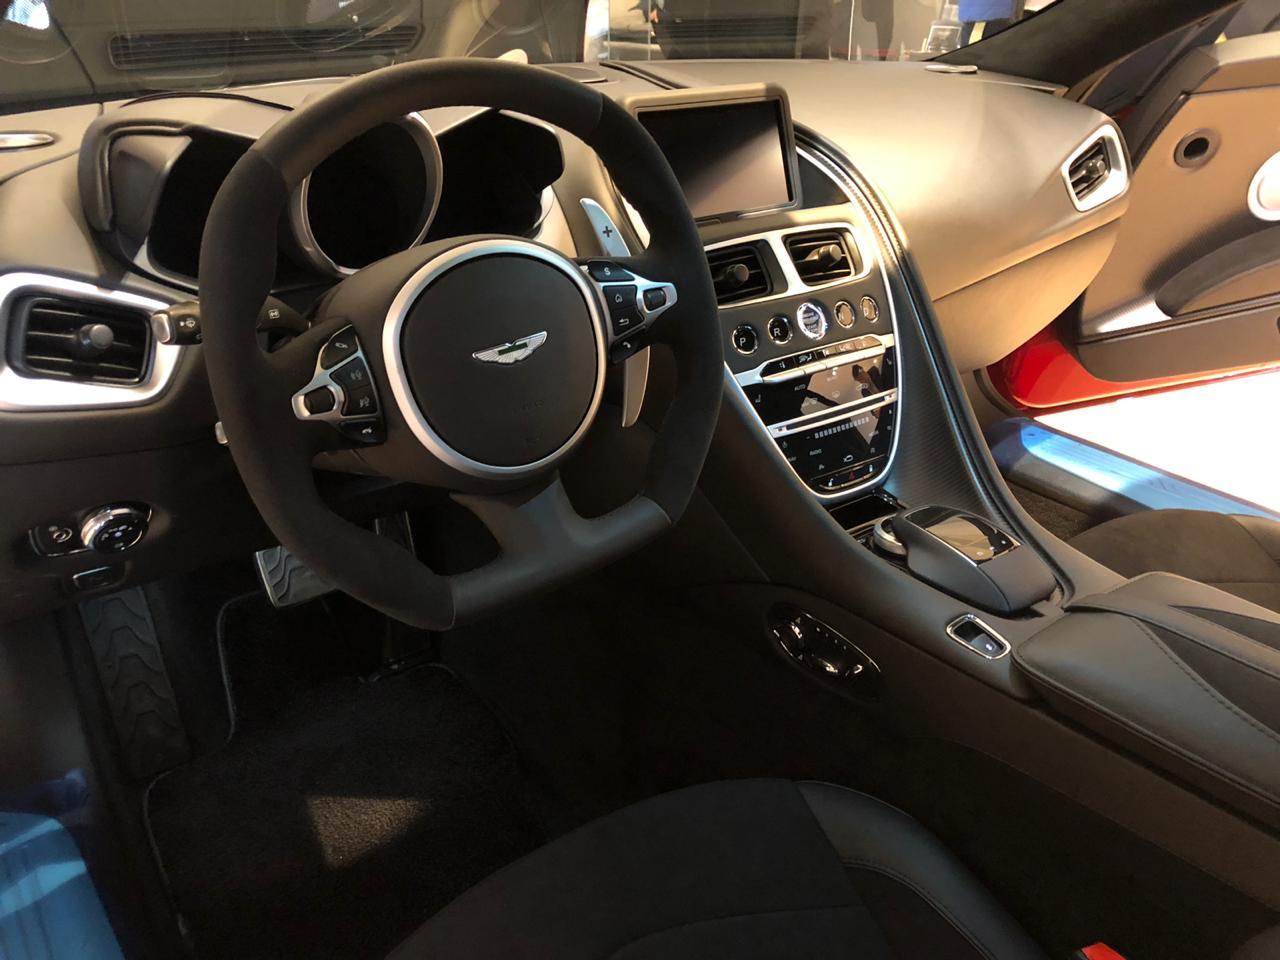 Aterriza En Chile El Nuevo Aston Martin Dbs Superleggera